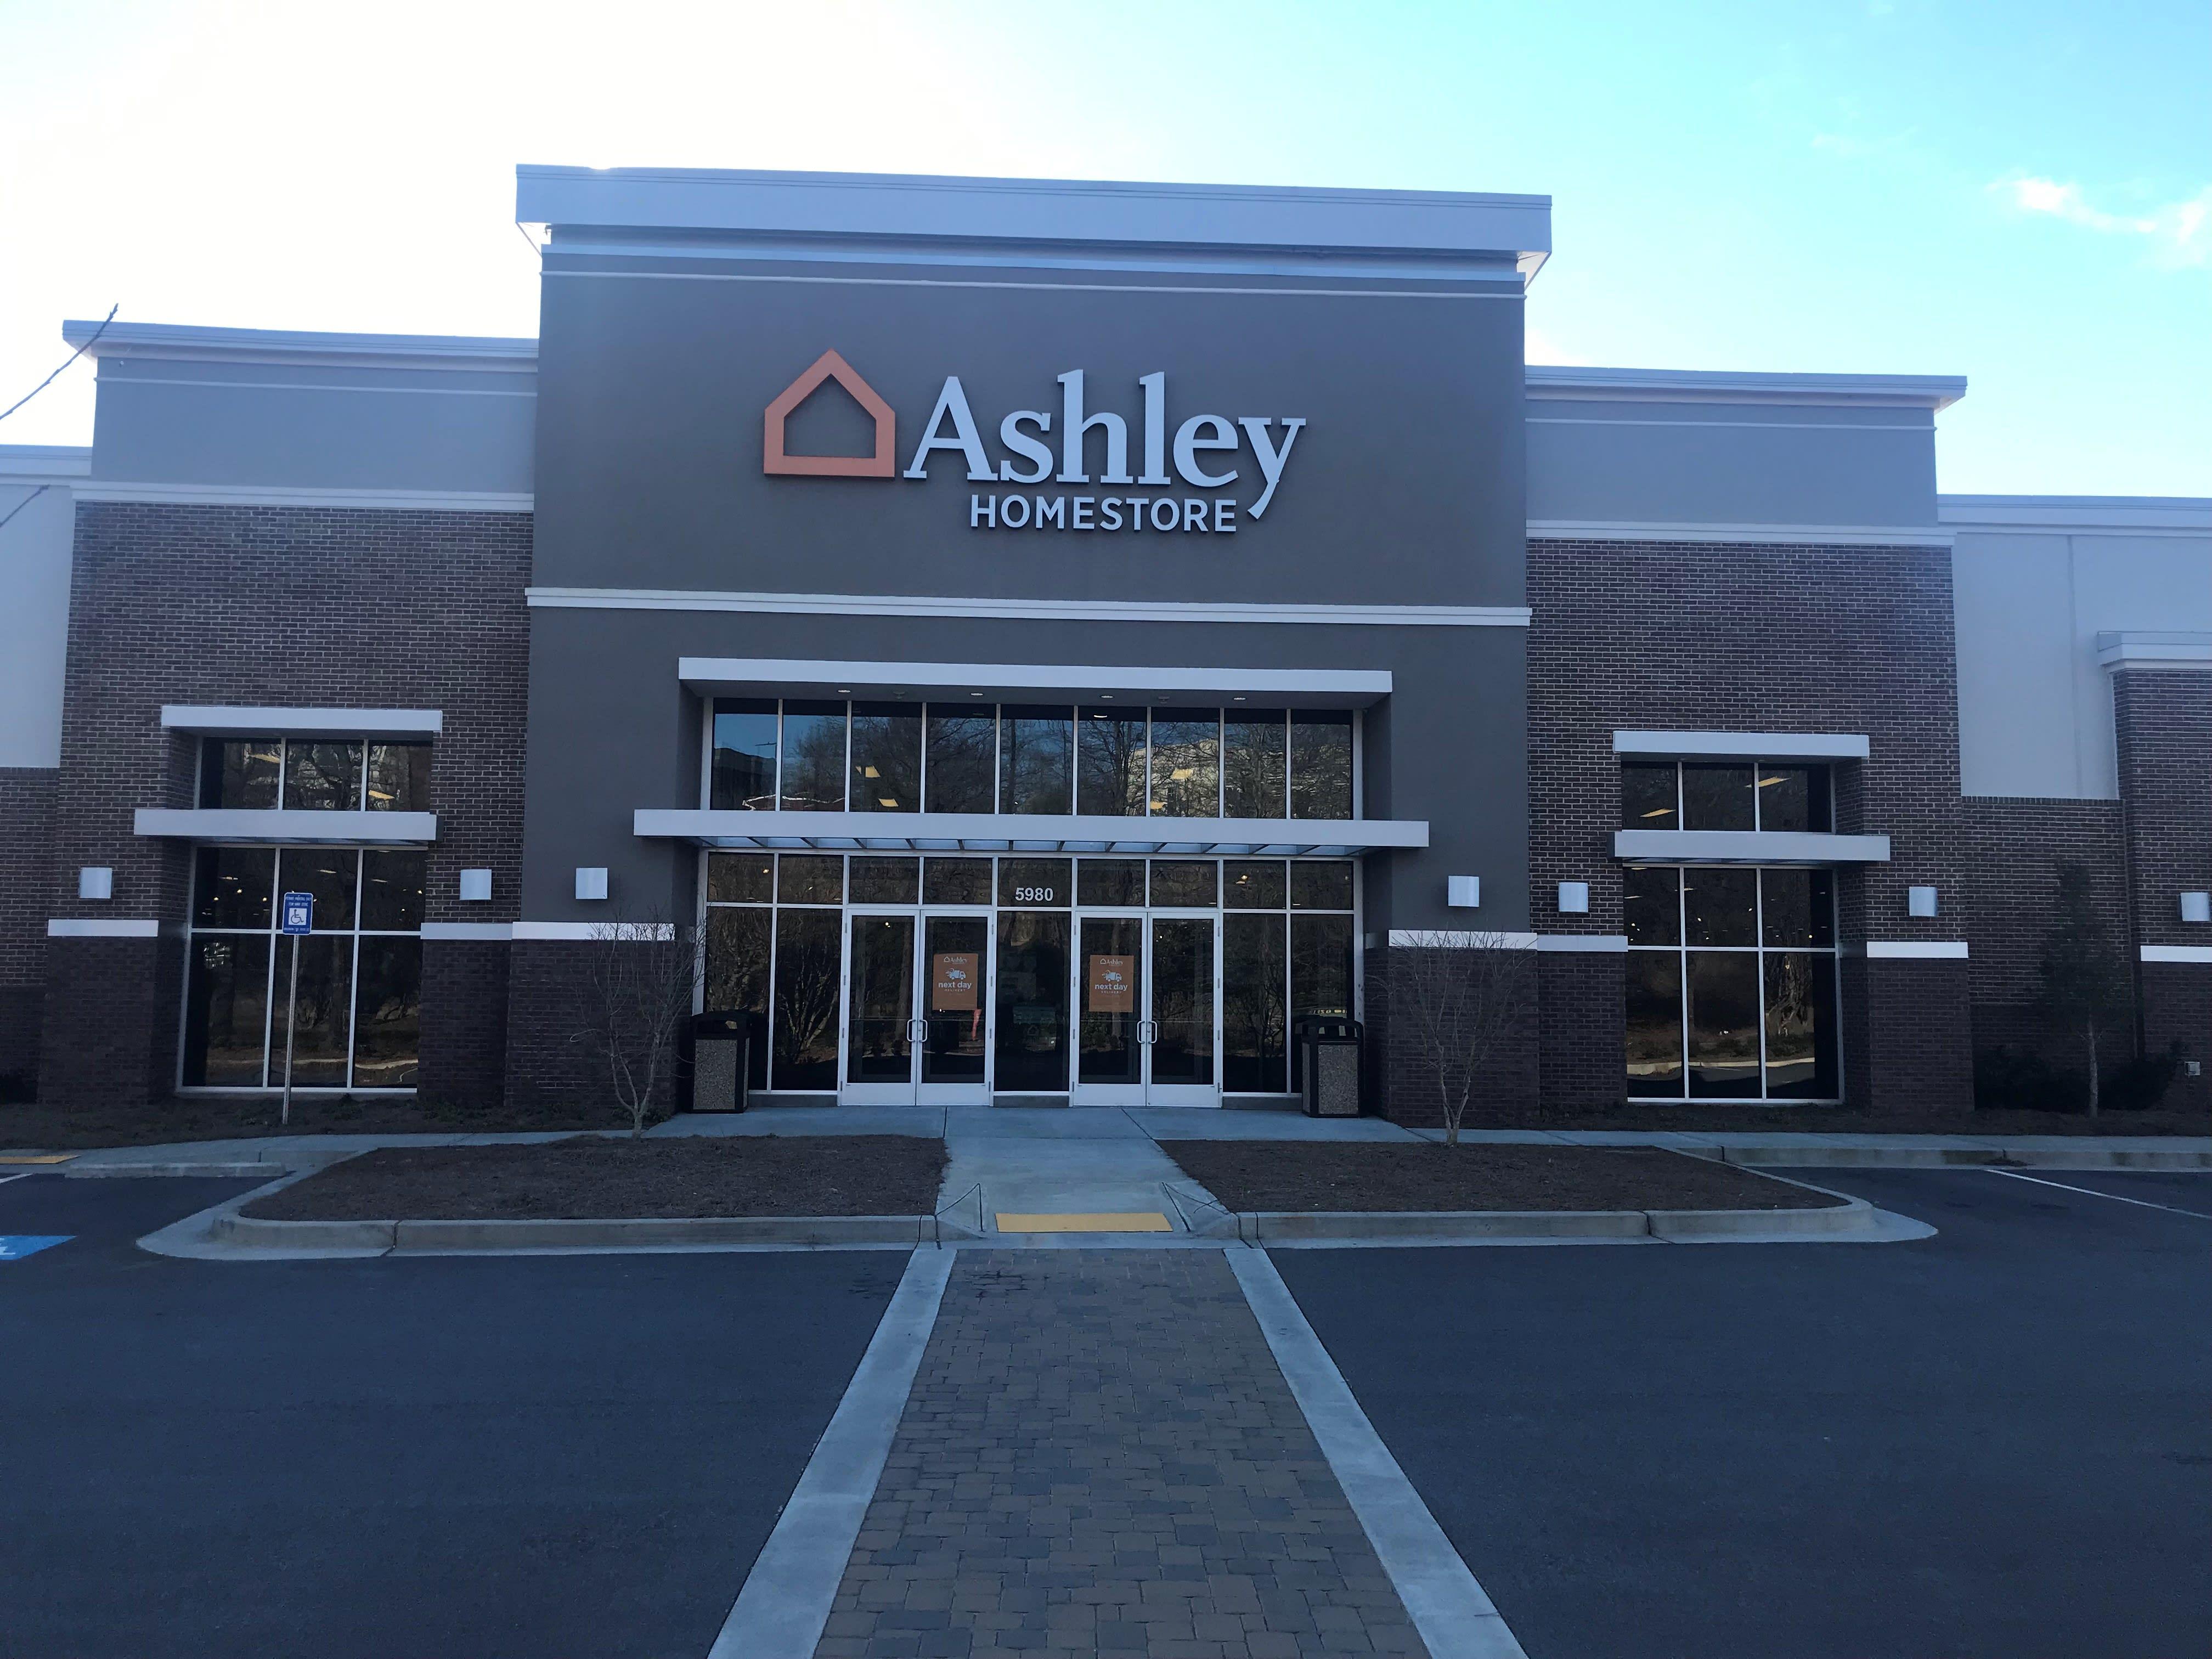 Furniture And Mattress Store At 5980 N Point Pkwy Alpharetta Ga Ashley Homestore